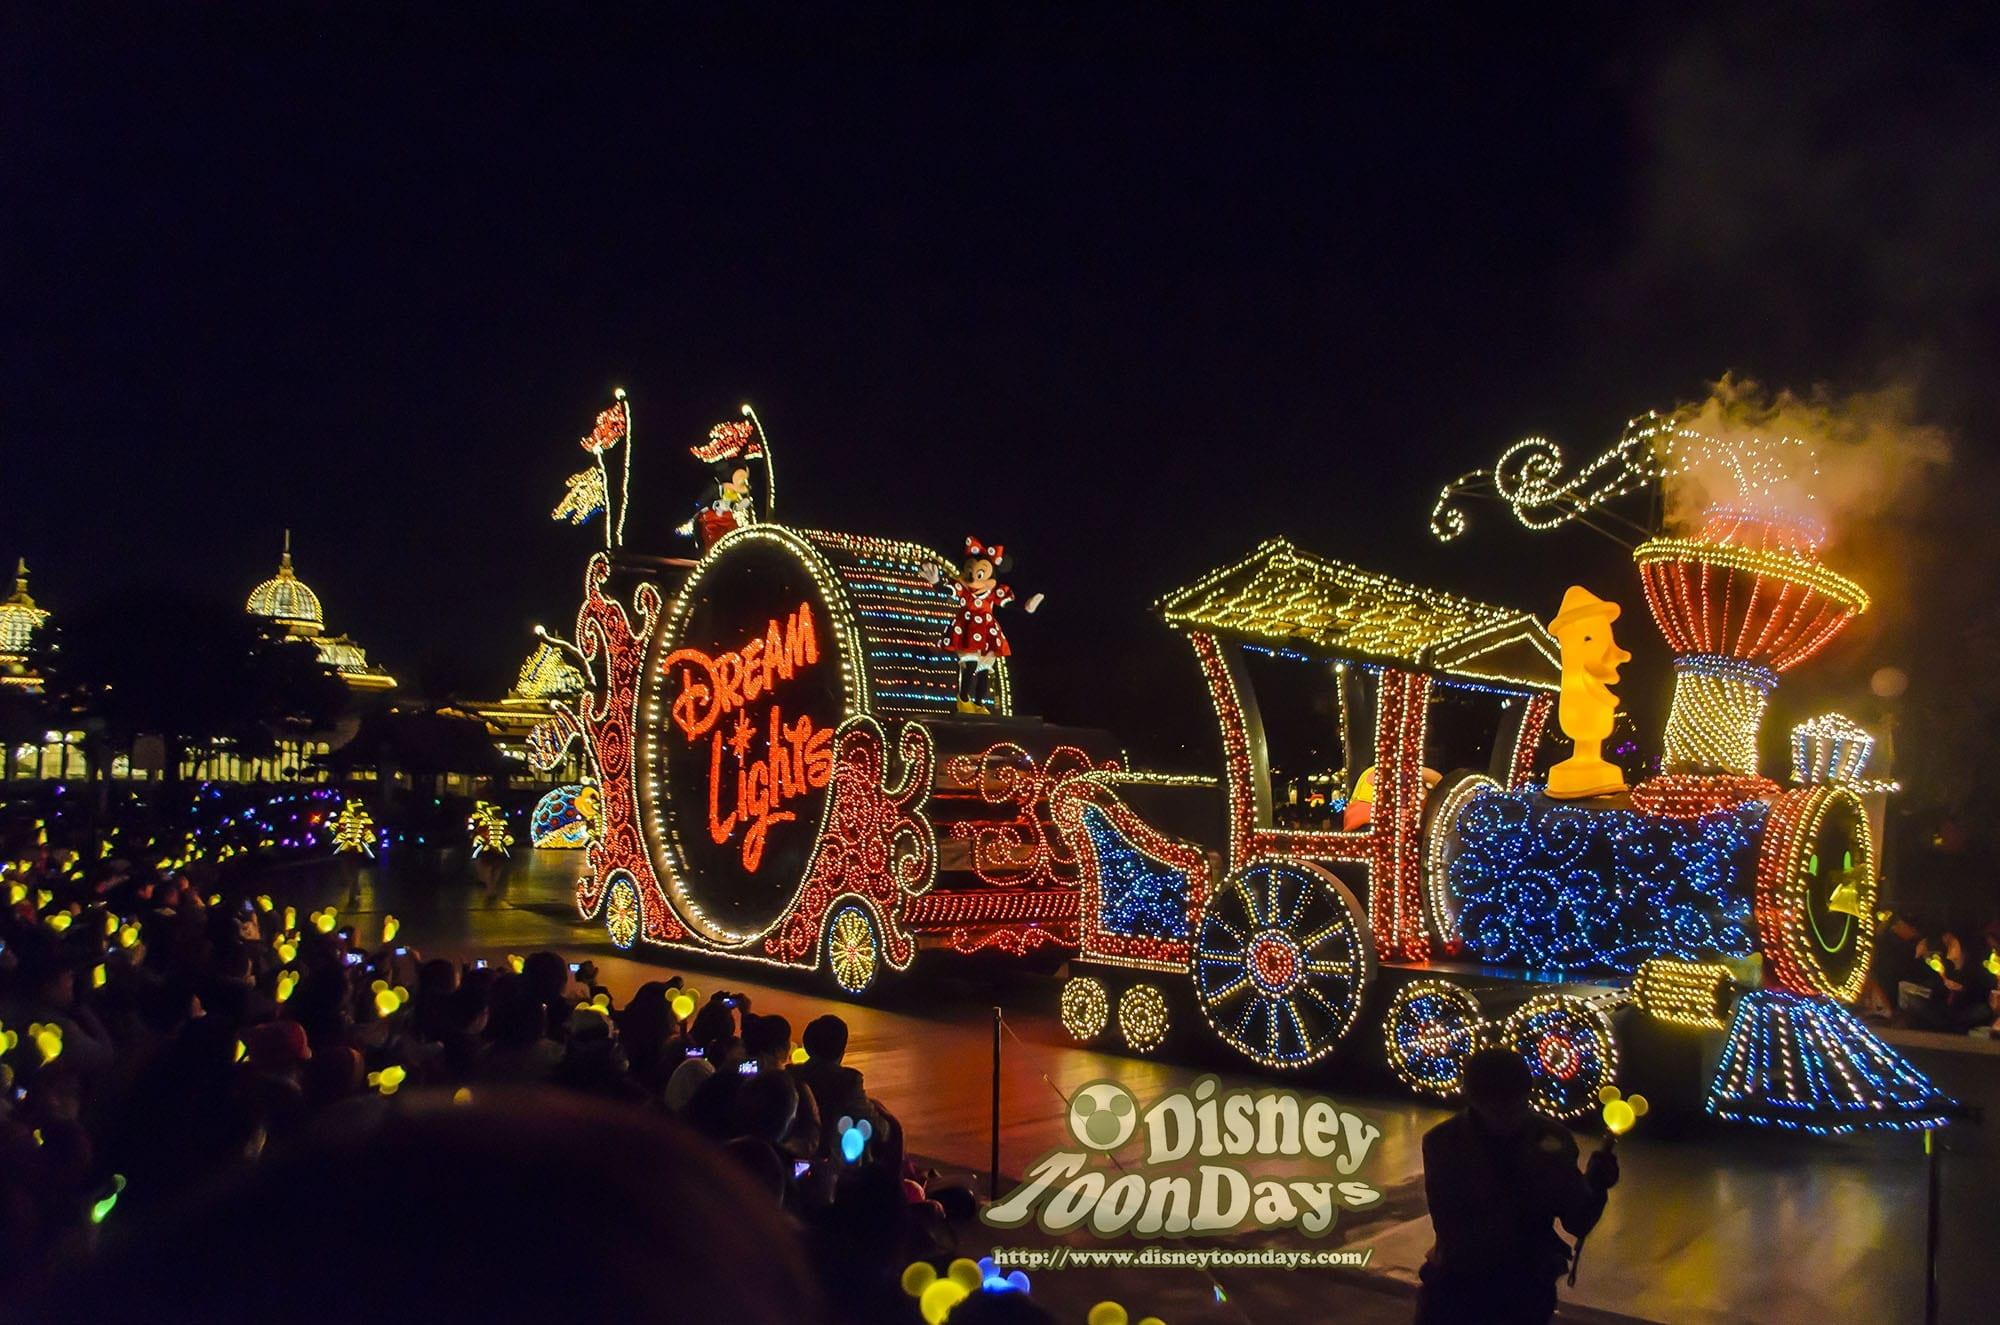 TDL ディズニーJCBカード5周年記念スペシャルナイトat東京ディズニーランド プライベートイブニングパーティー 東京ディズニーランド・エレクトリカルパレード・ドリームライツ ミッキーマウス ミニーマウス グーフィー